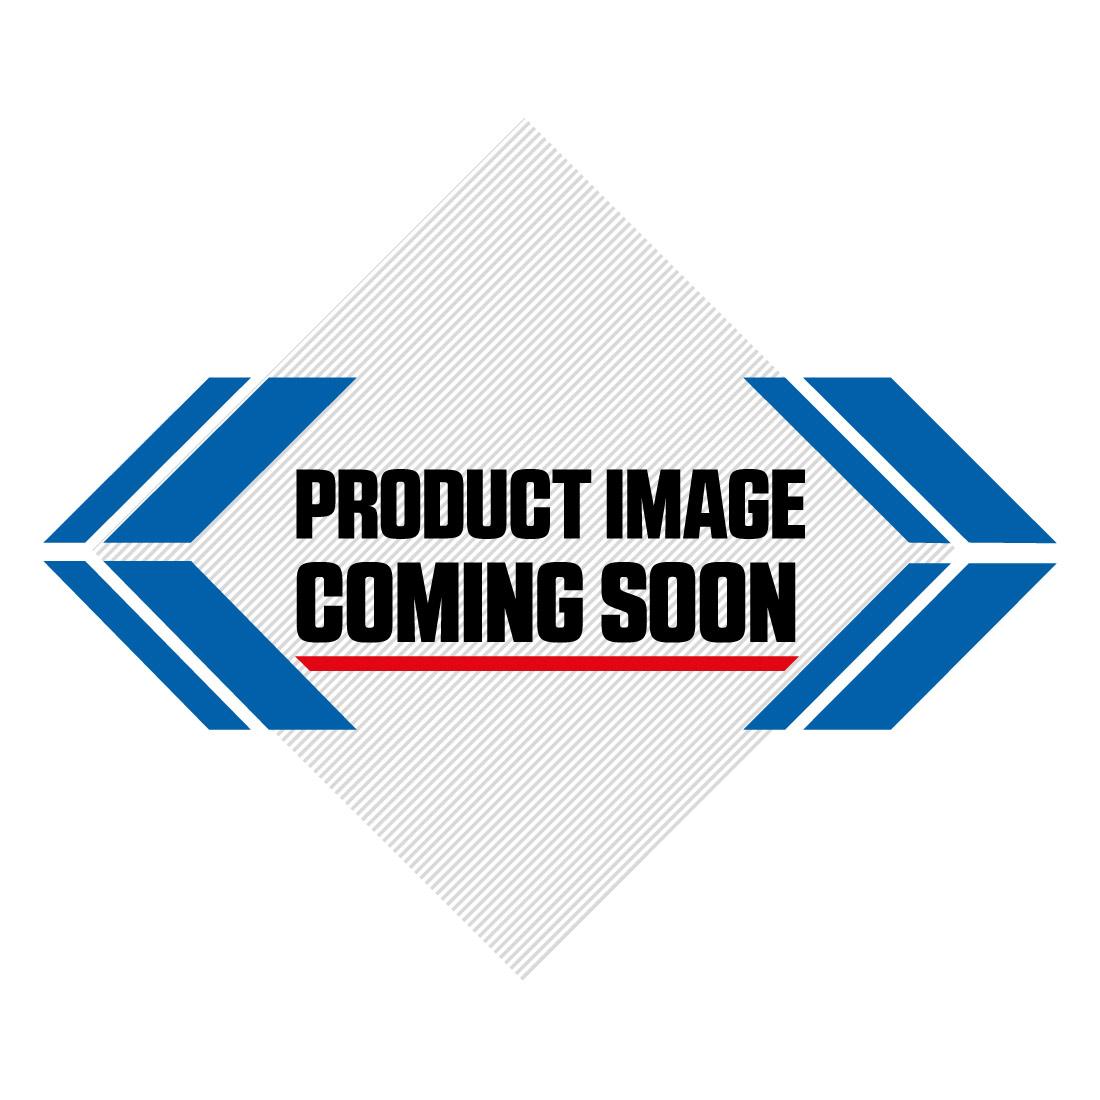 Kawasaki Restyled Plastic Kit KX 85 (01-09) (11-12) OEM Factory Image-0